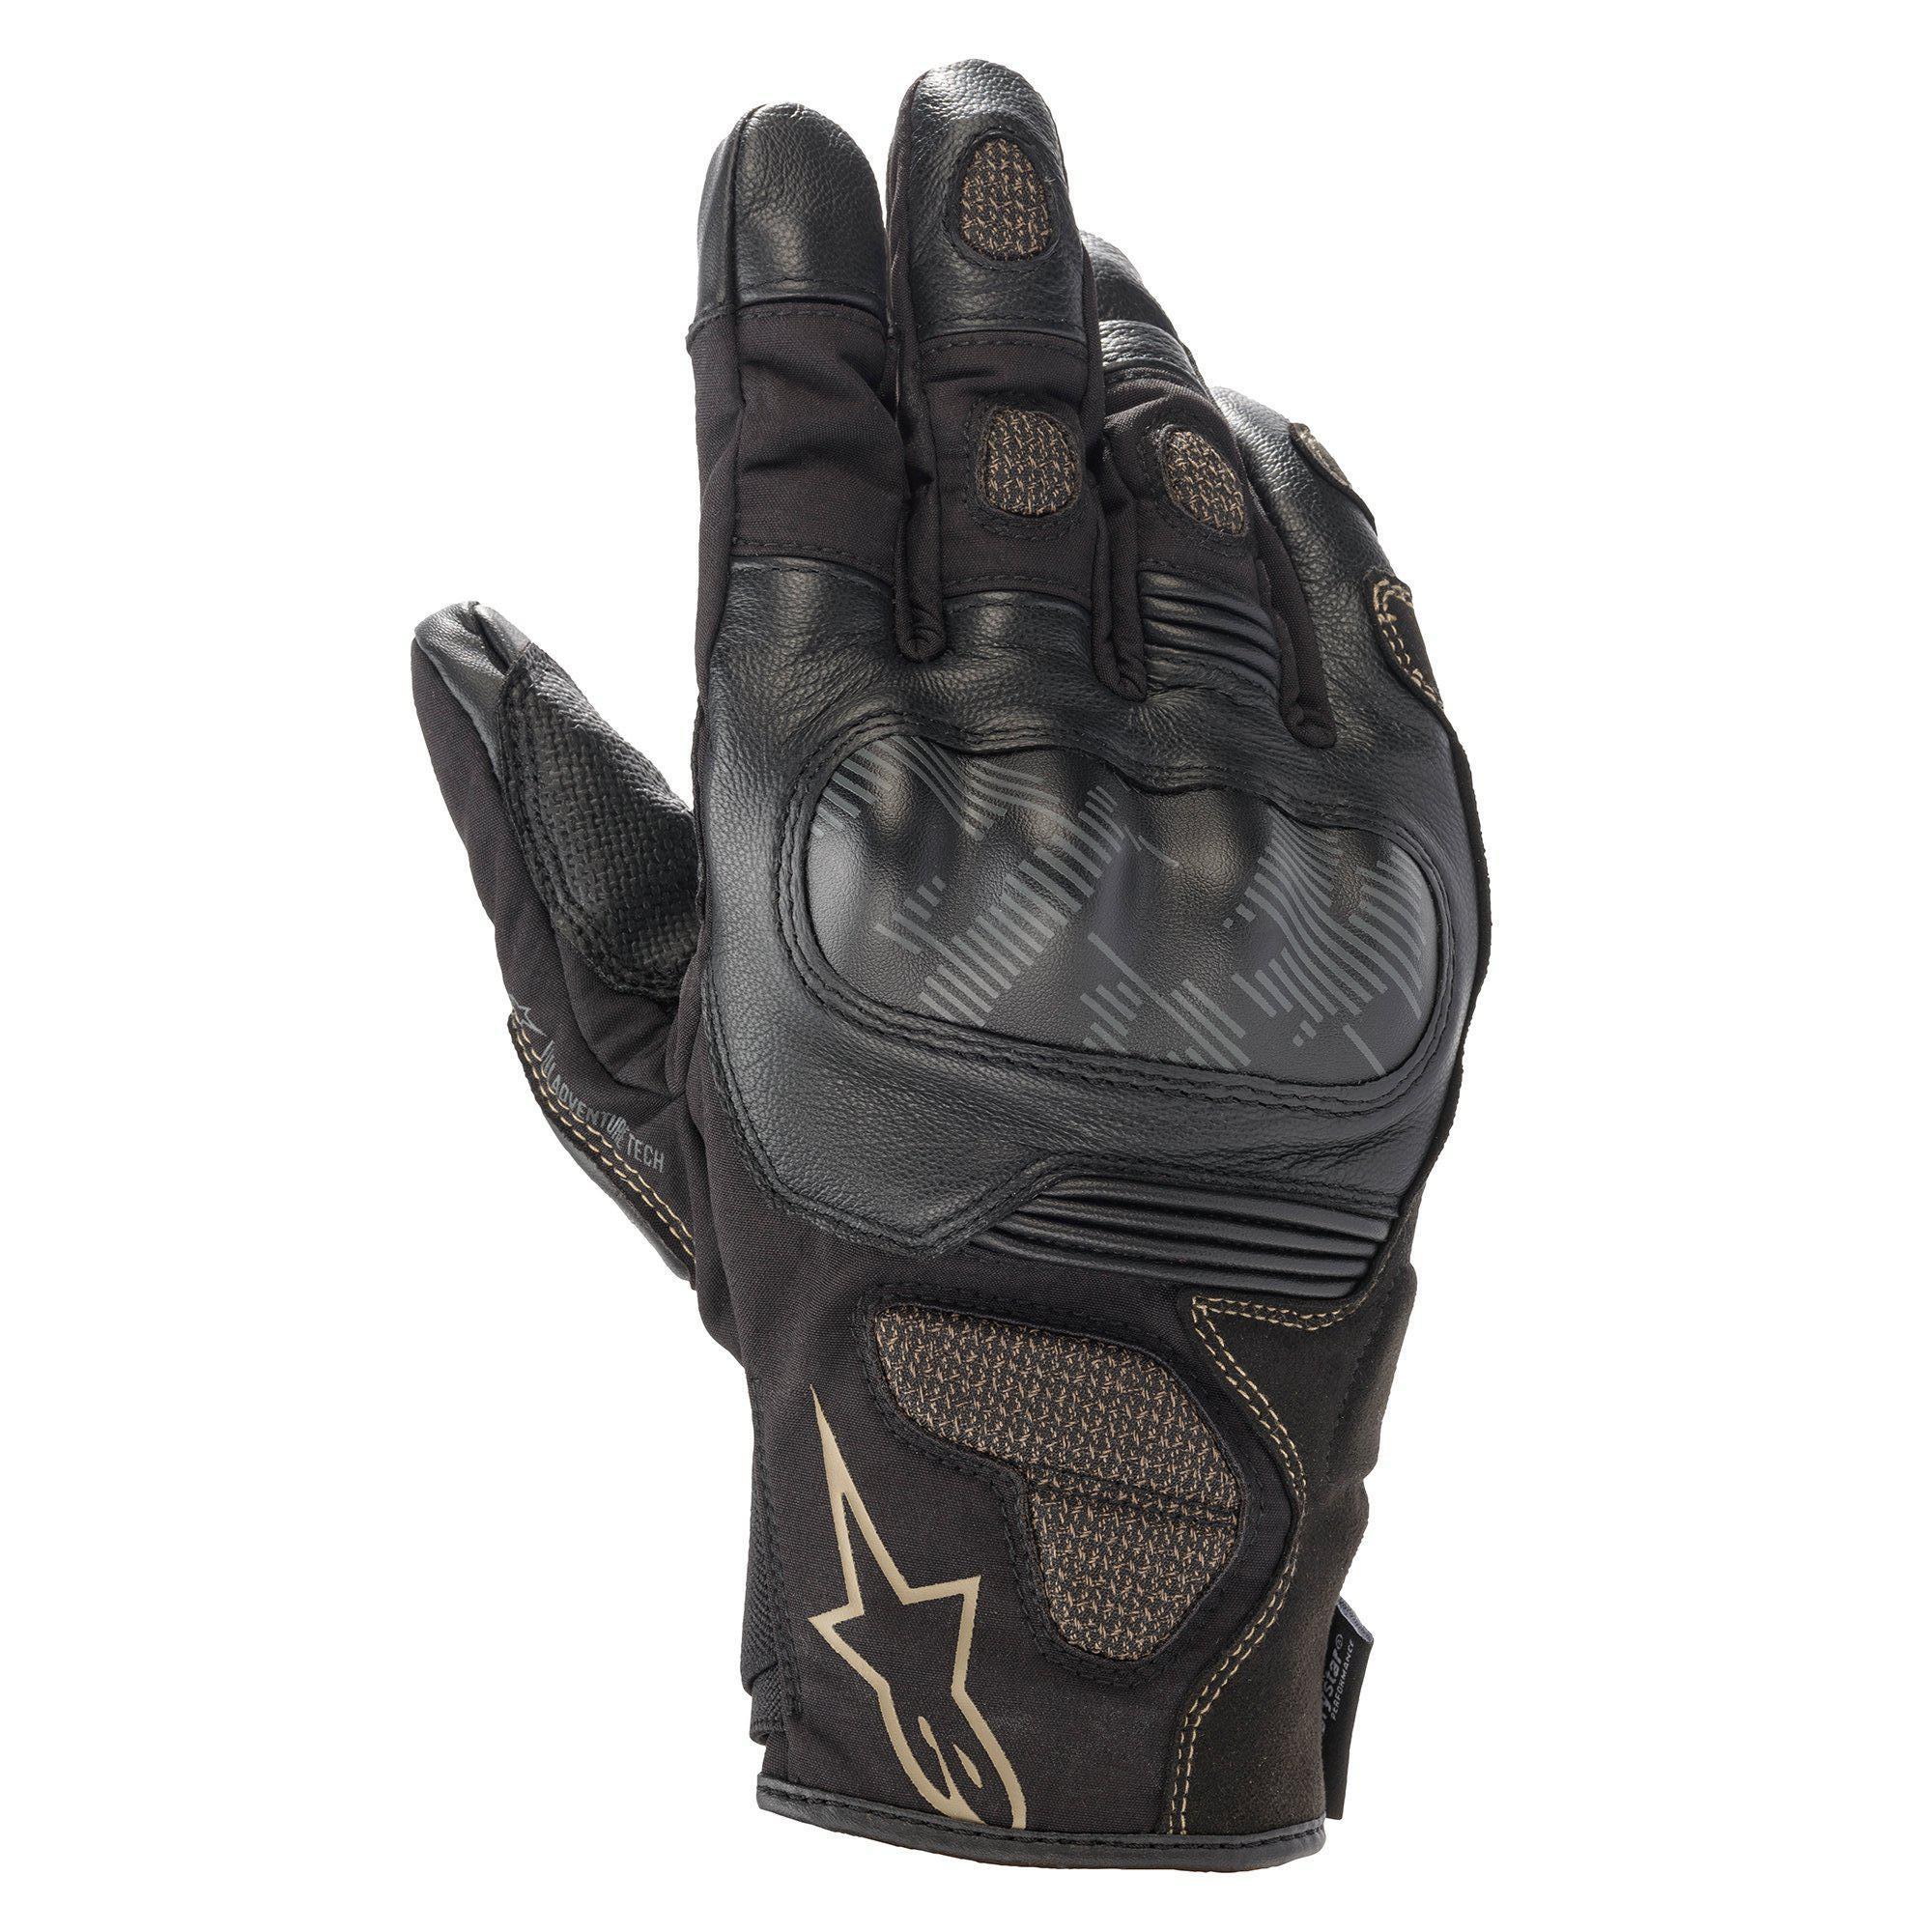 Alpinestars Corozal V2 Drystar Black/Sand Gloves